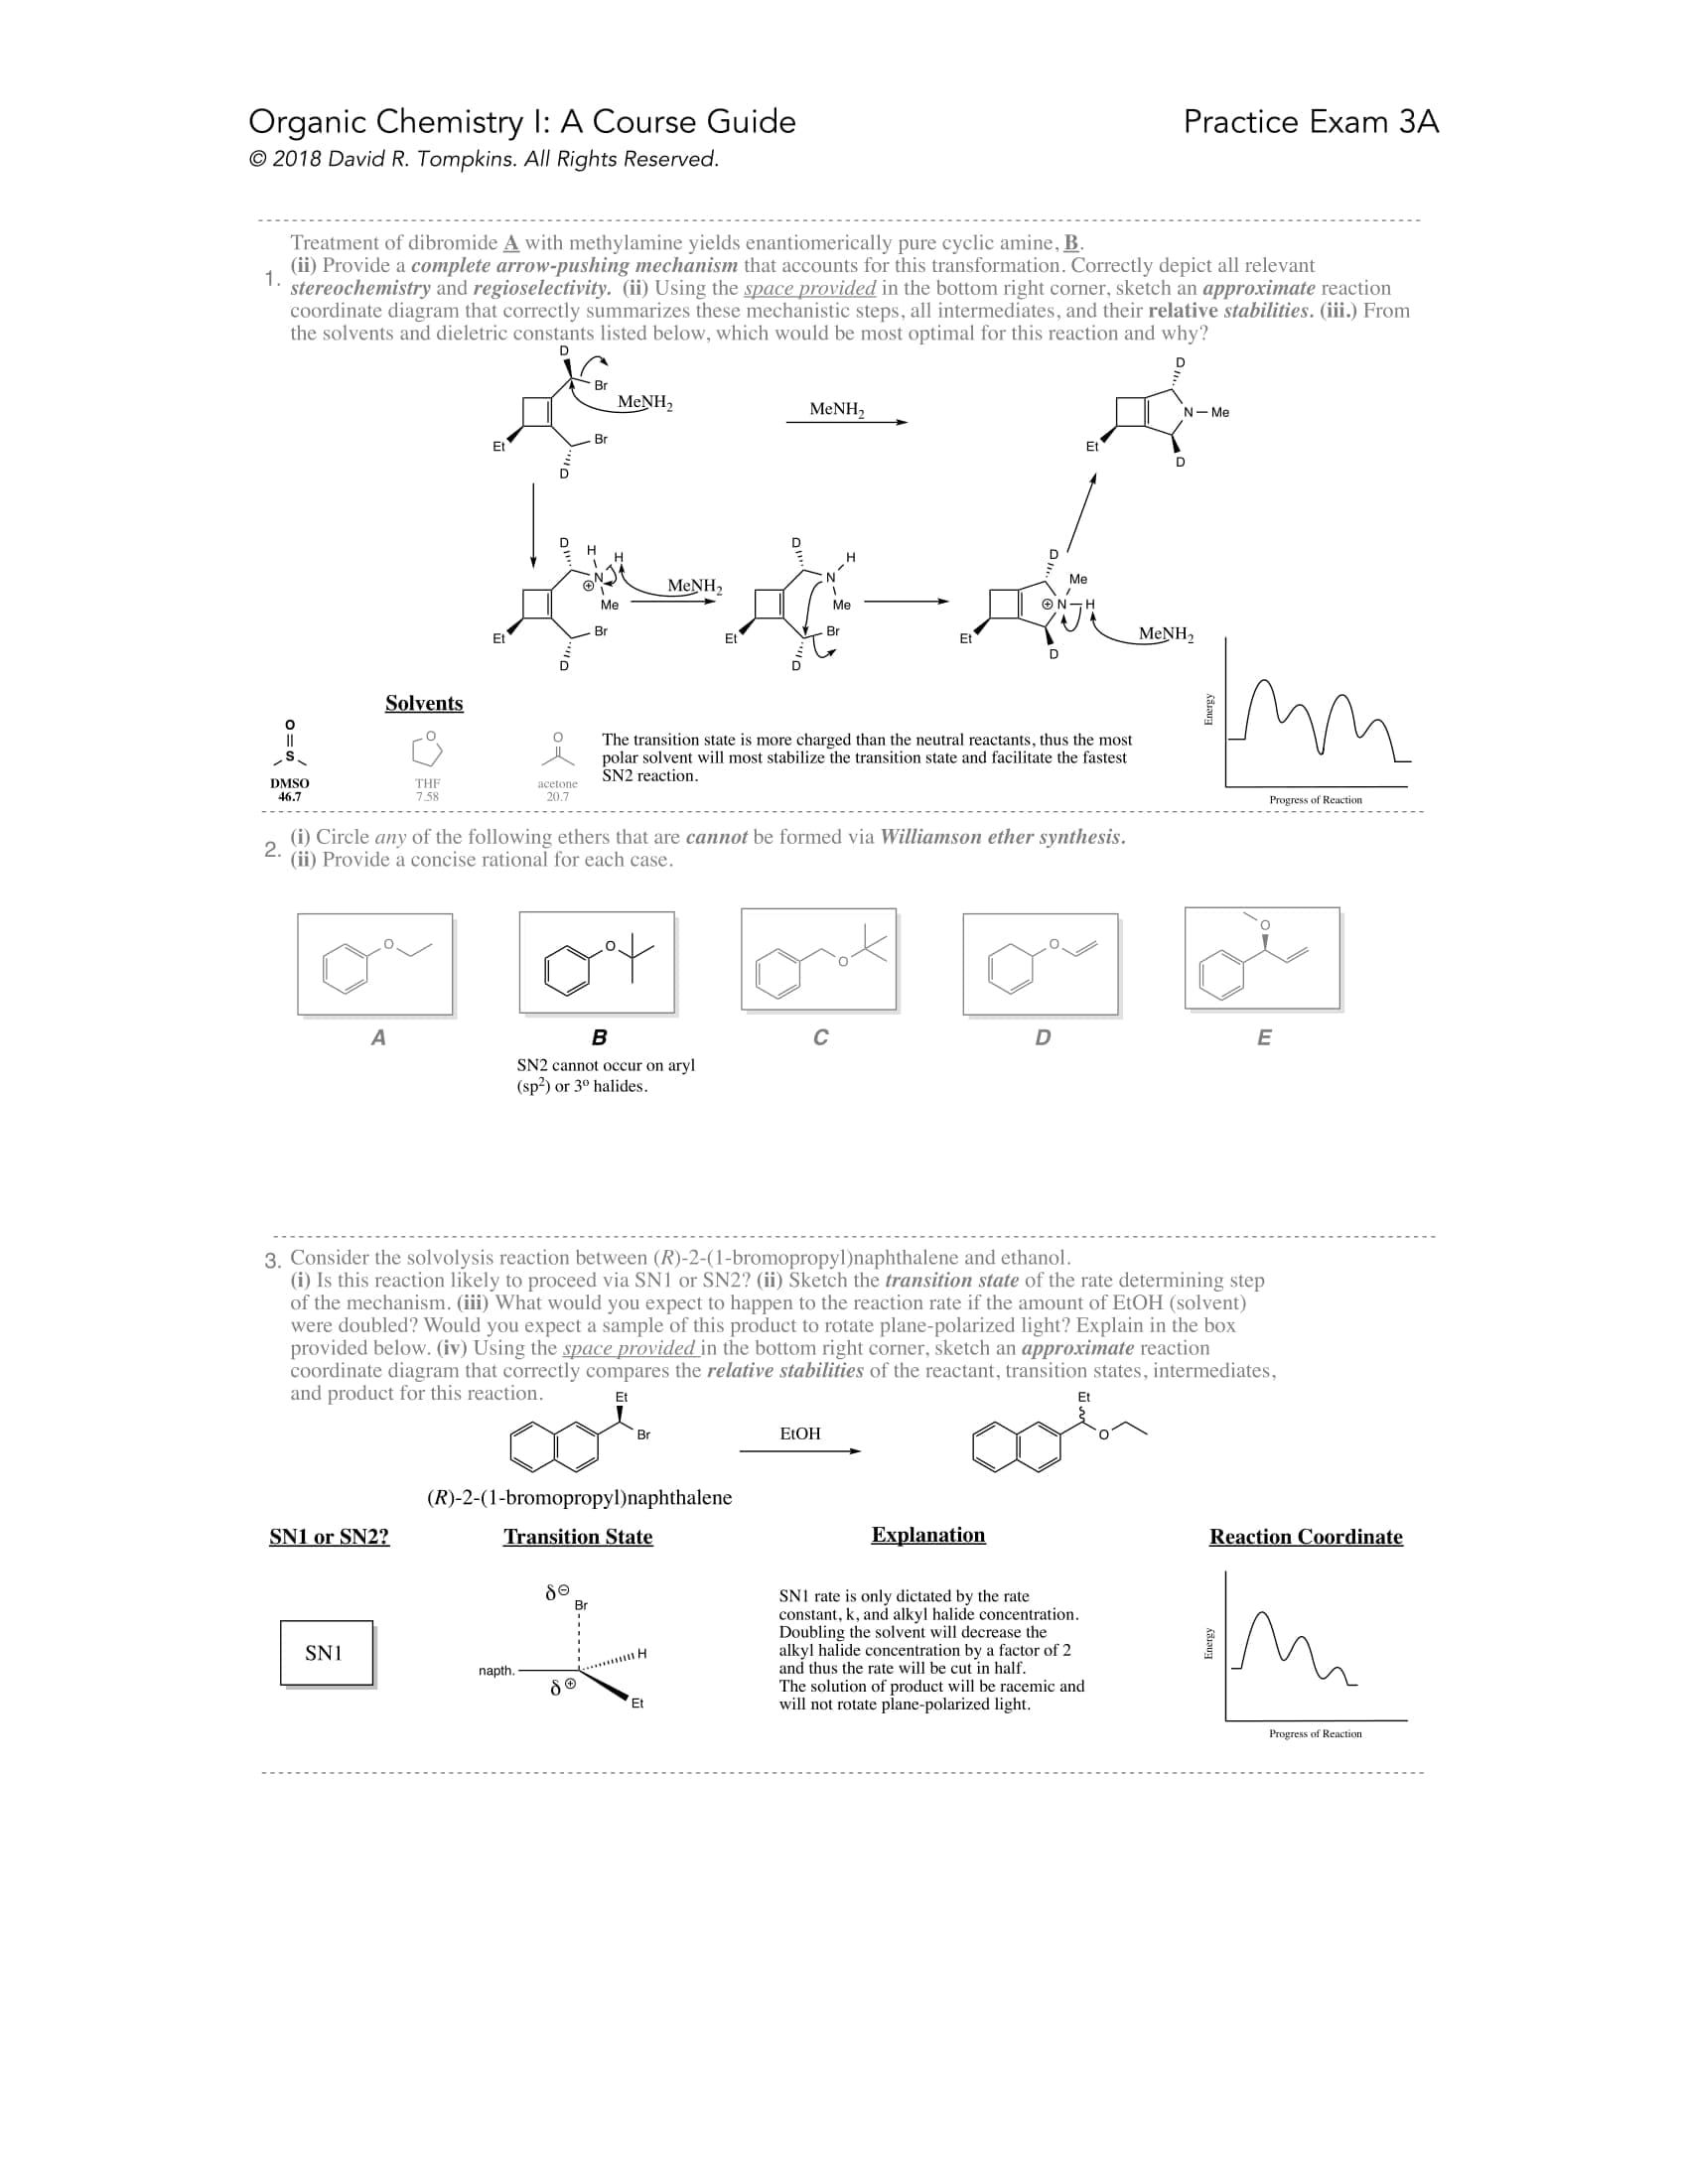 Chemguides: Premier Chemistry Tutoring Services